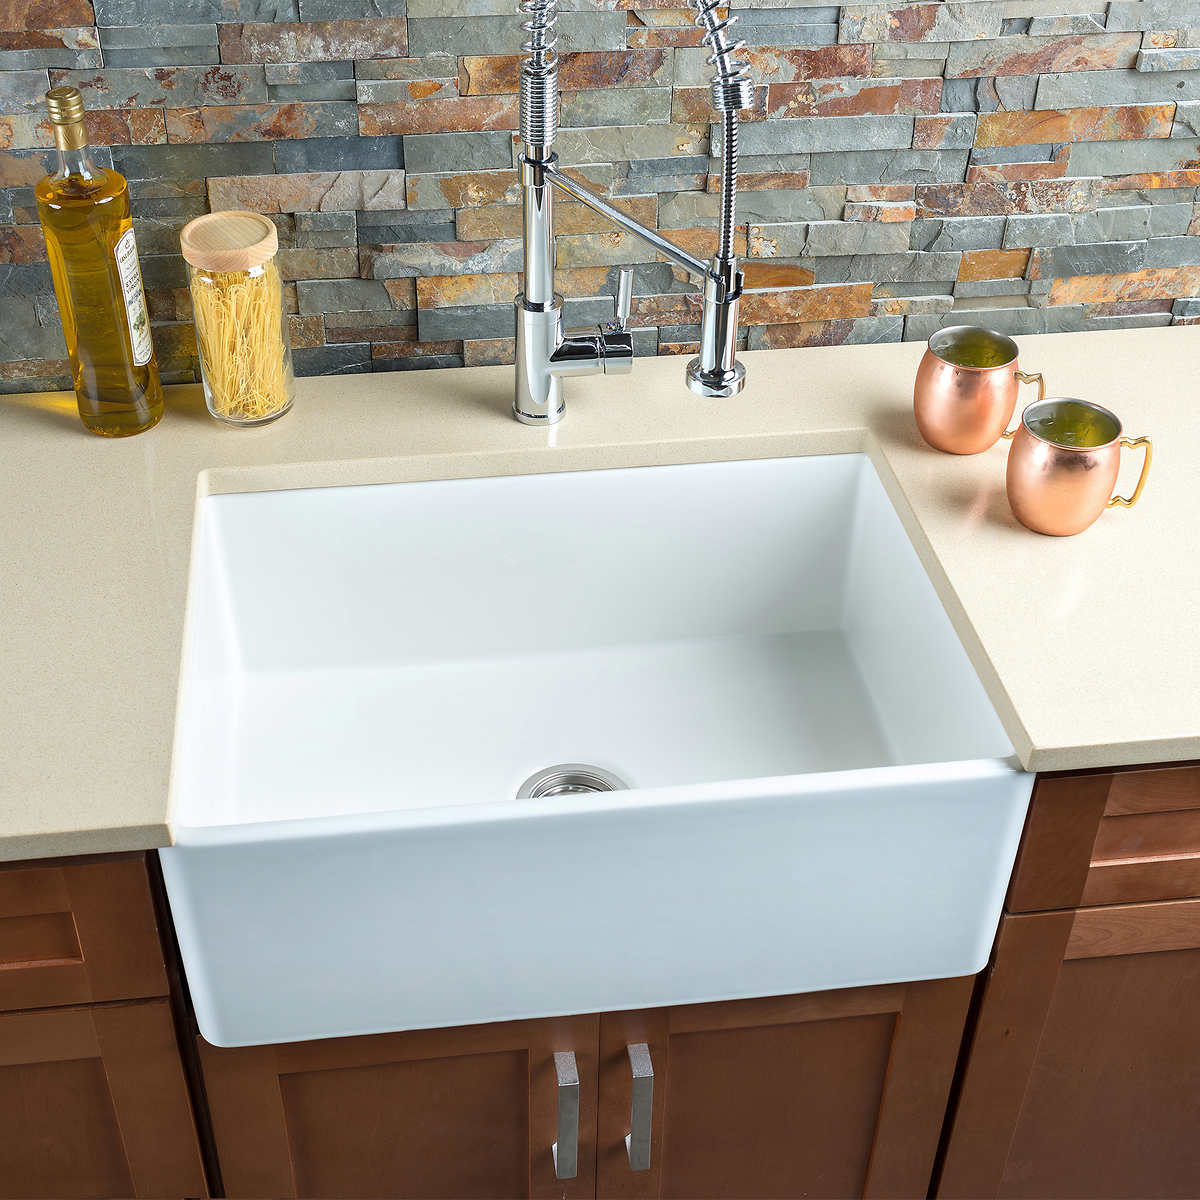 White granite apron sink - Hahn Fireclay Series Medium Single Farmhouse Kitchen Sink